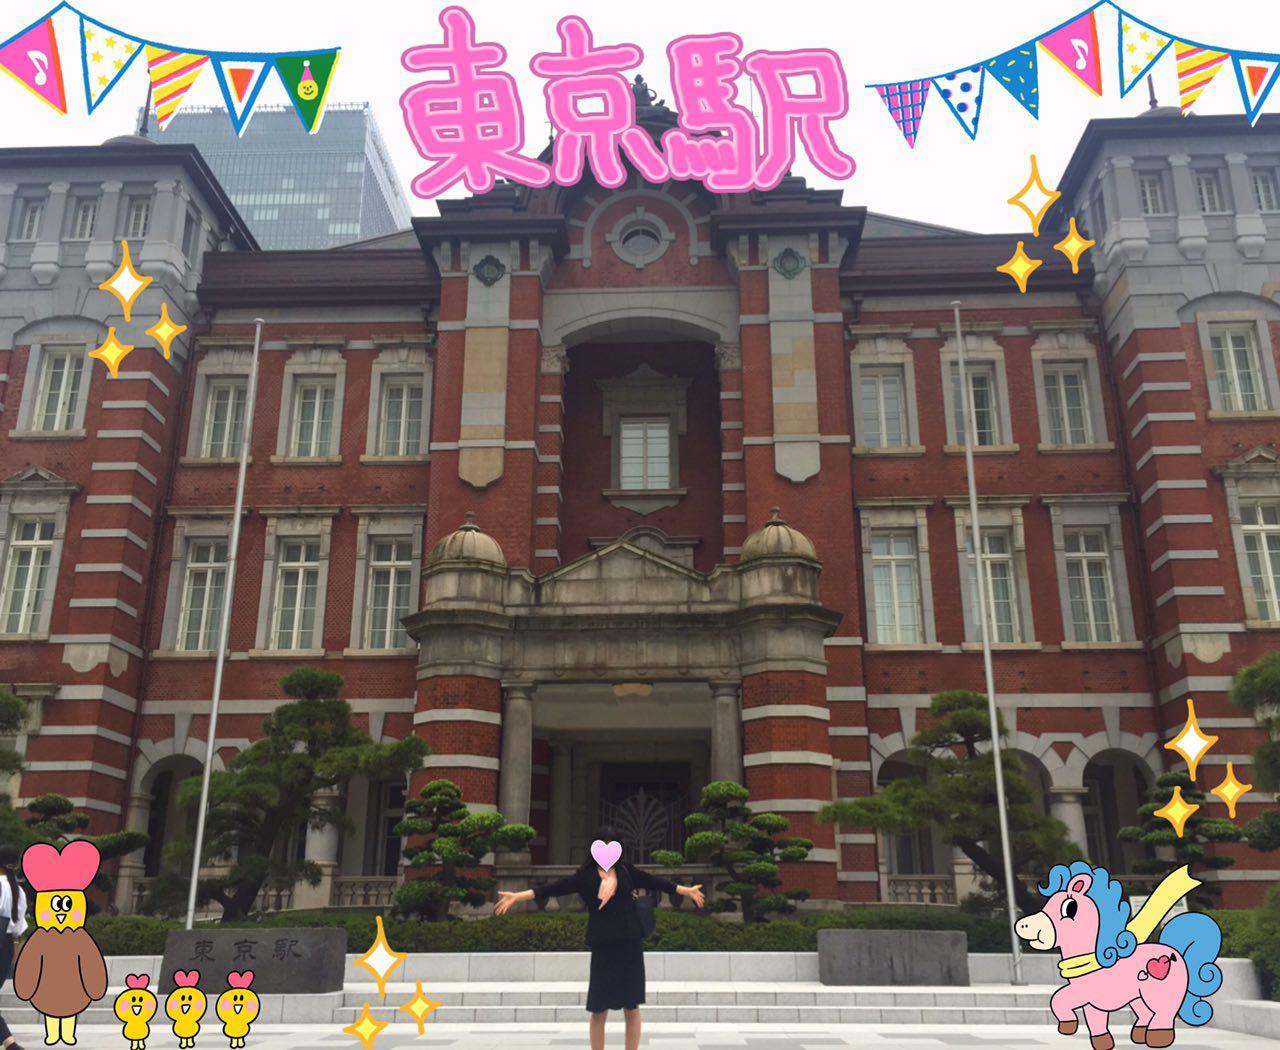 photo_2017-07-04_21-38-57.jpg